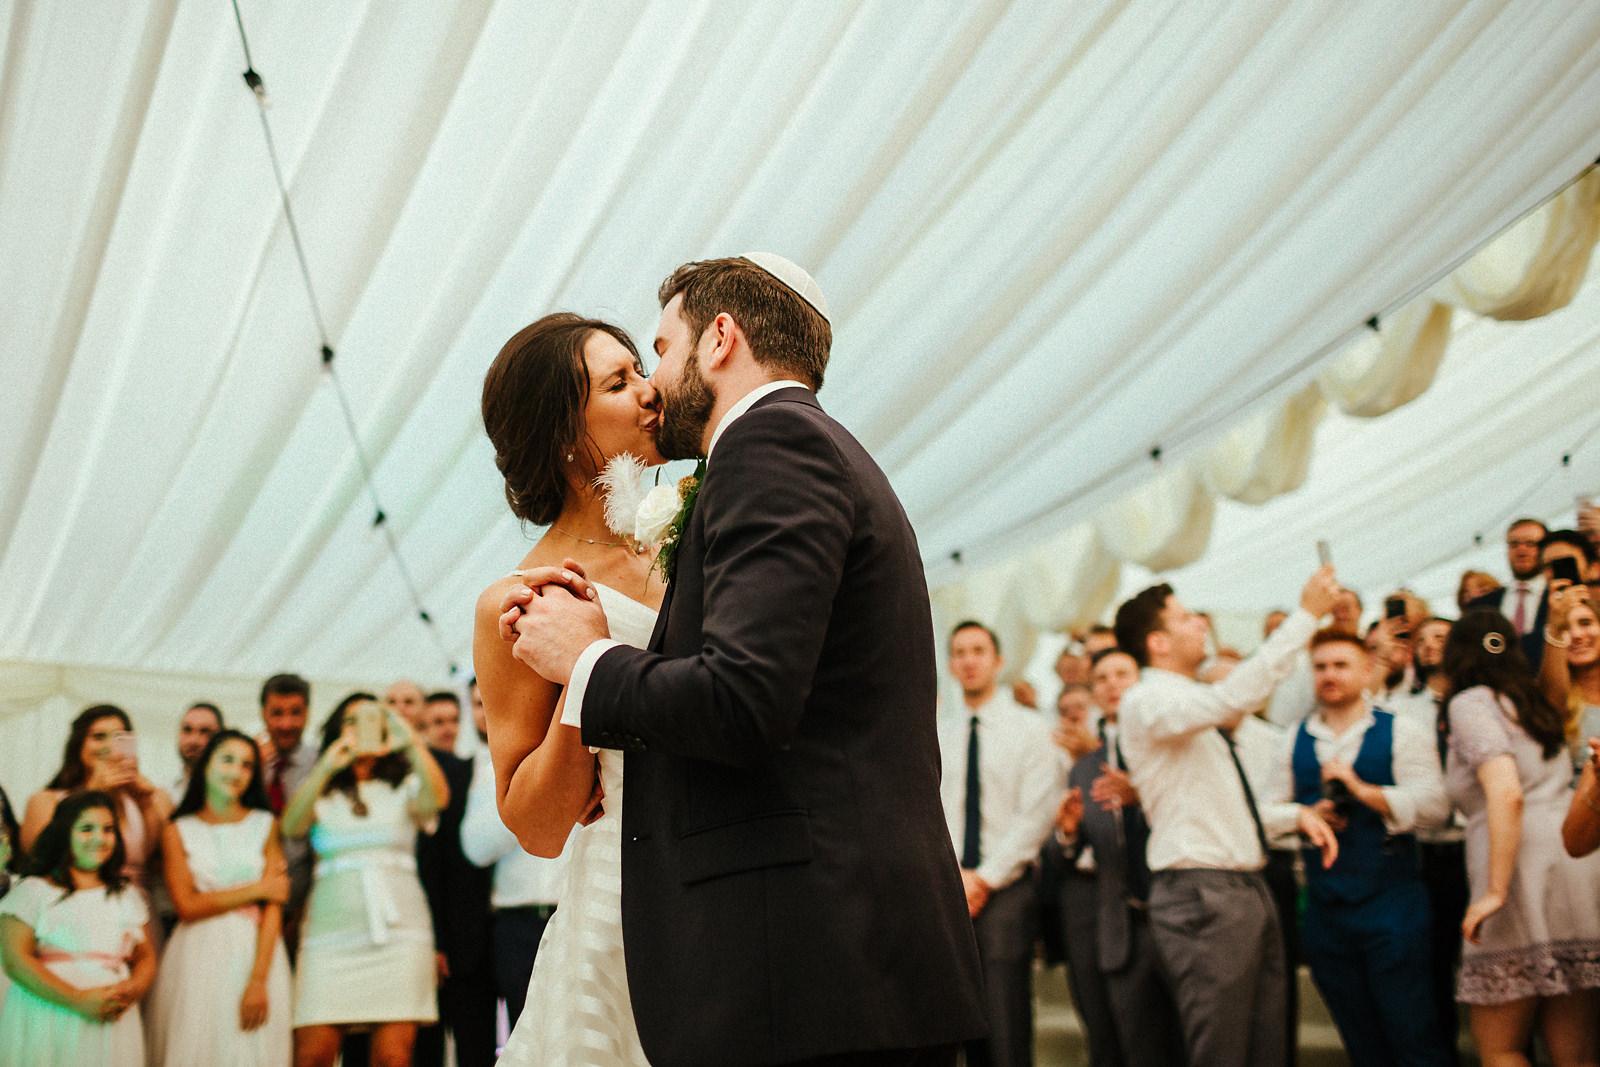 Bank holiday wedding ideas